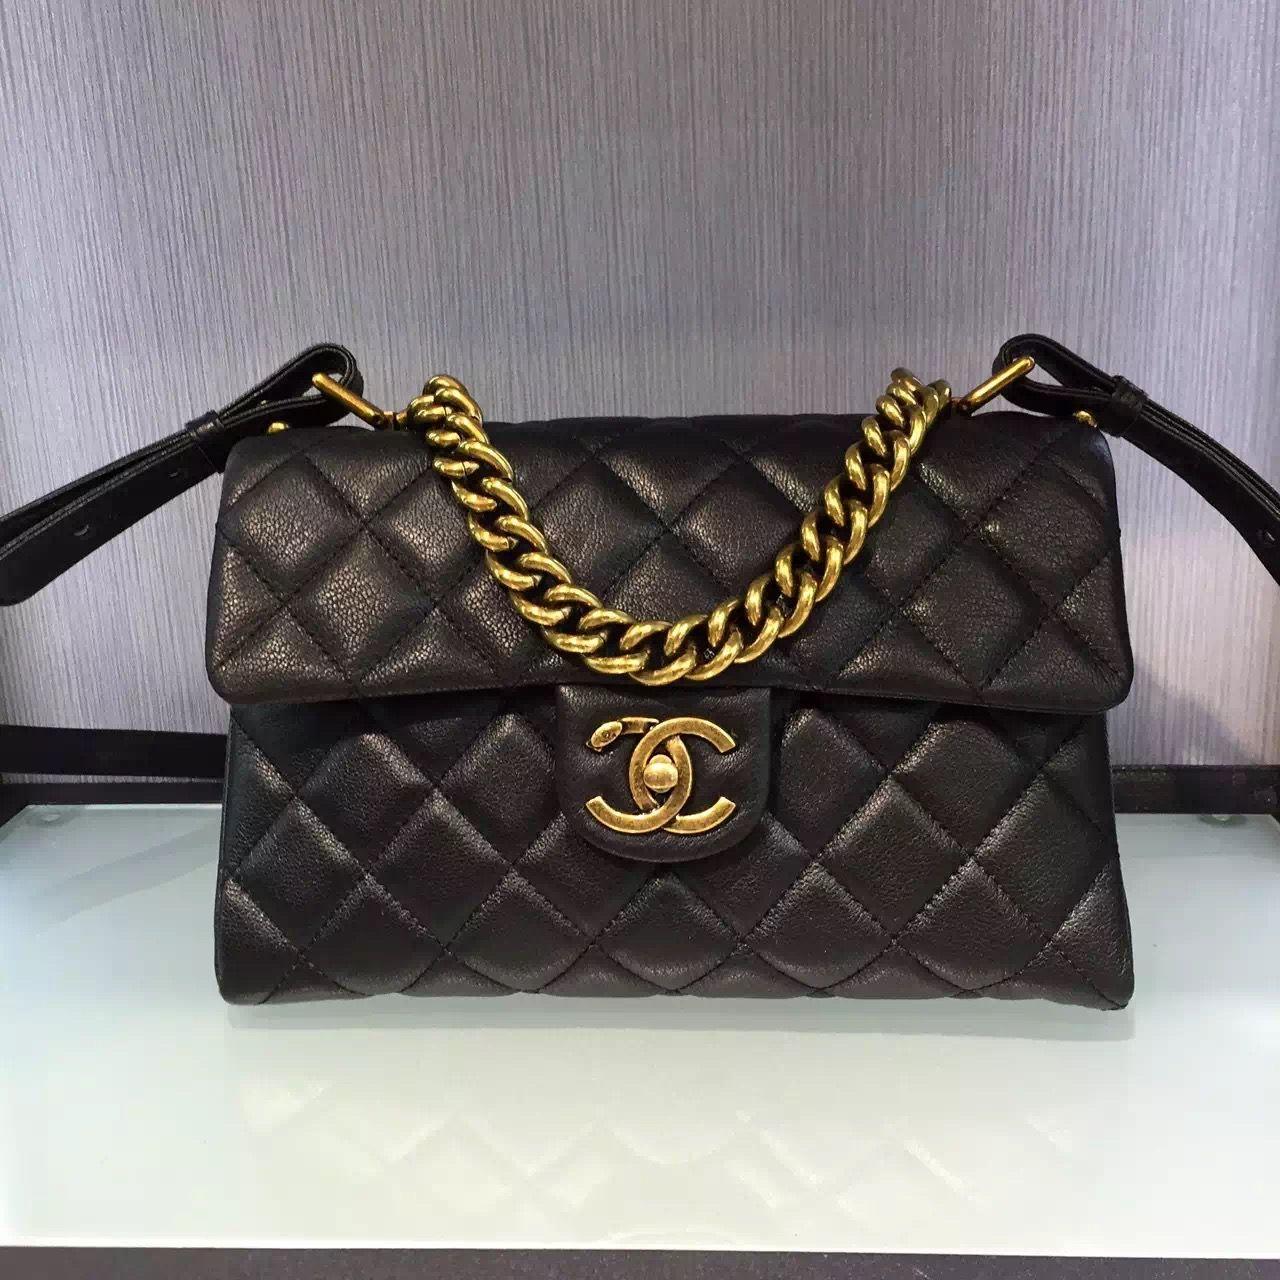 41af174e71be Chanel Sheepskin Medium Trapezio Flap Bag With Handle Paris 2016 $318  Email:winnie@shoescrazy.net